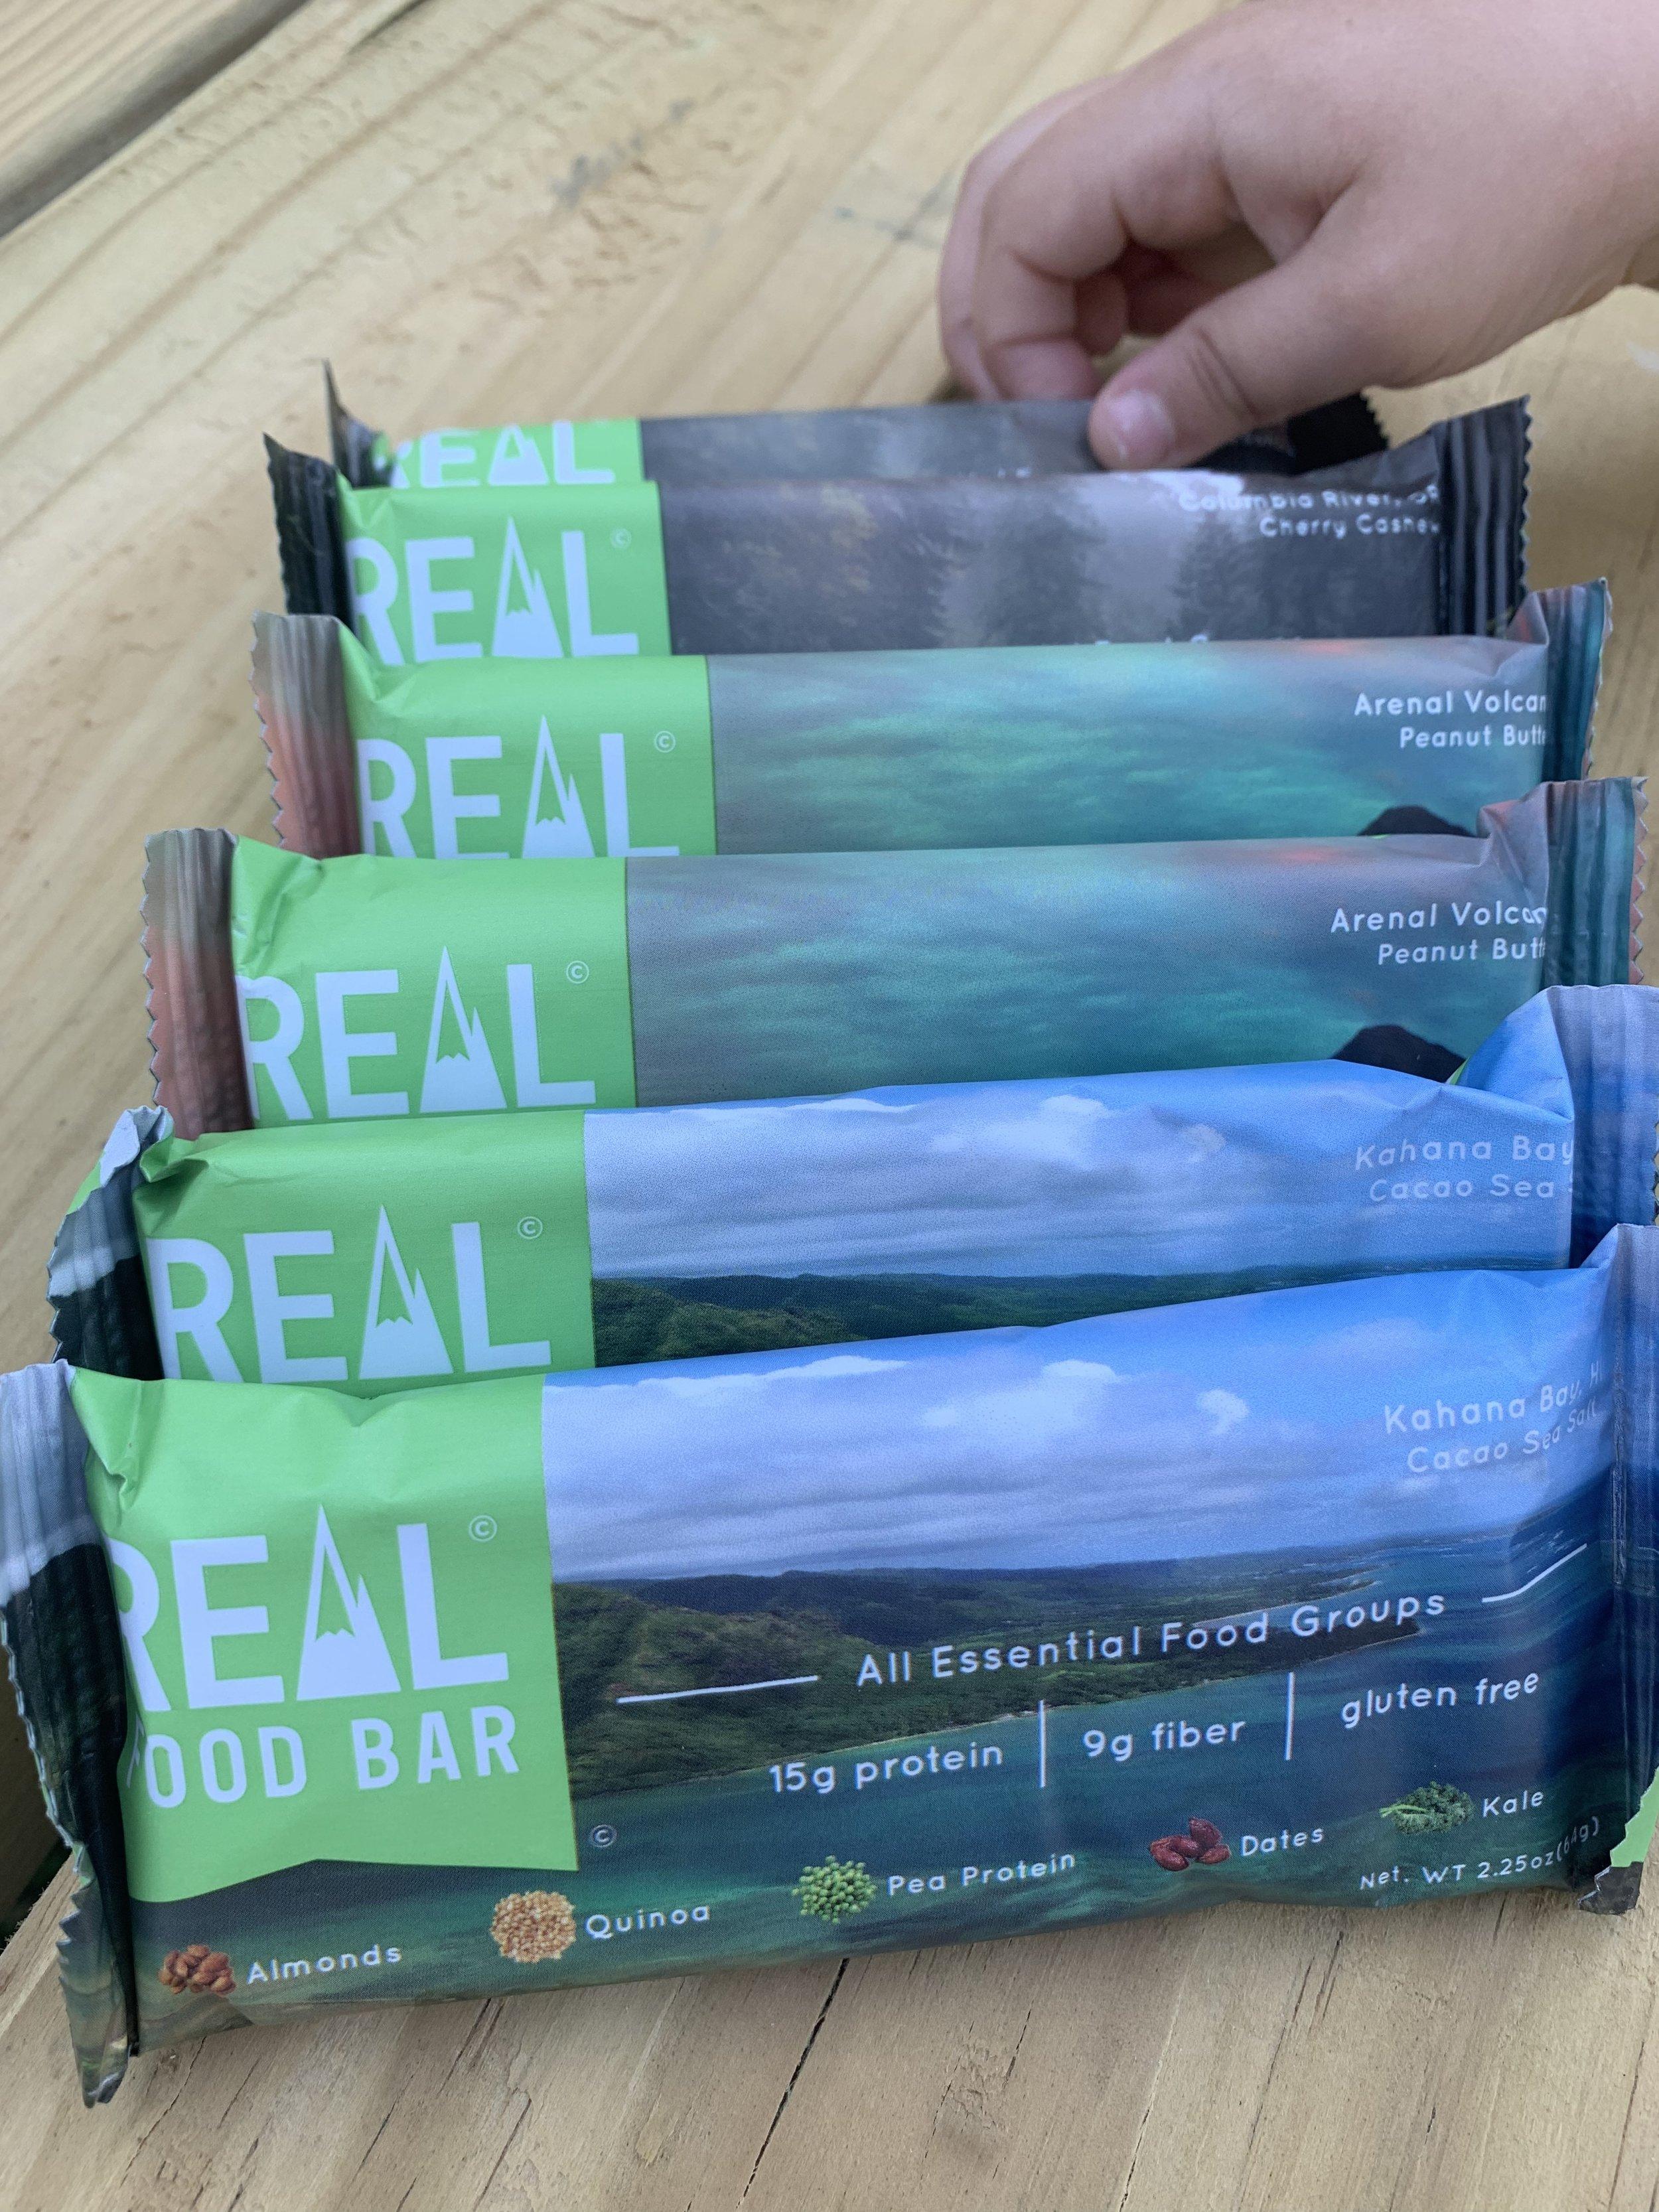 real food bar variety pack - realistic plant based mama - grand rapids mi